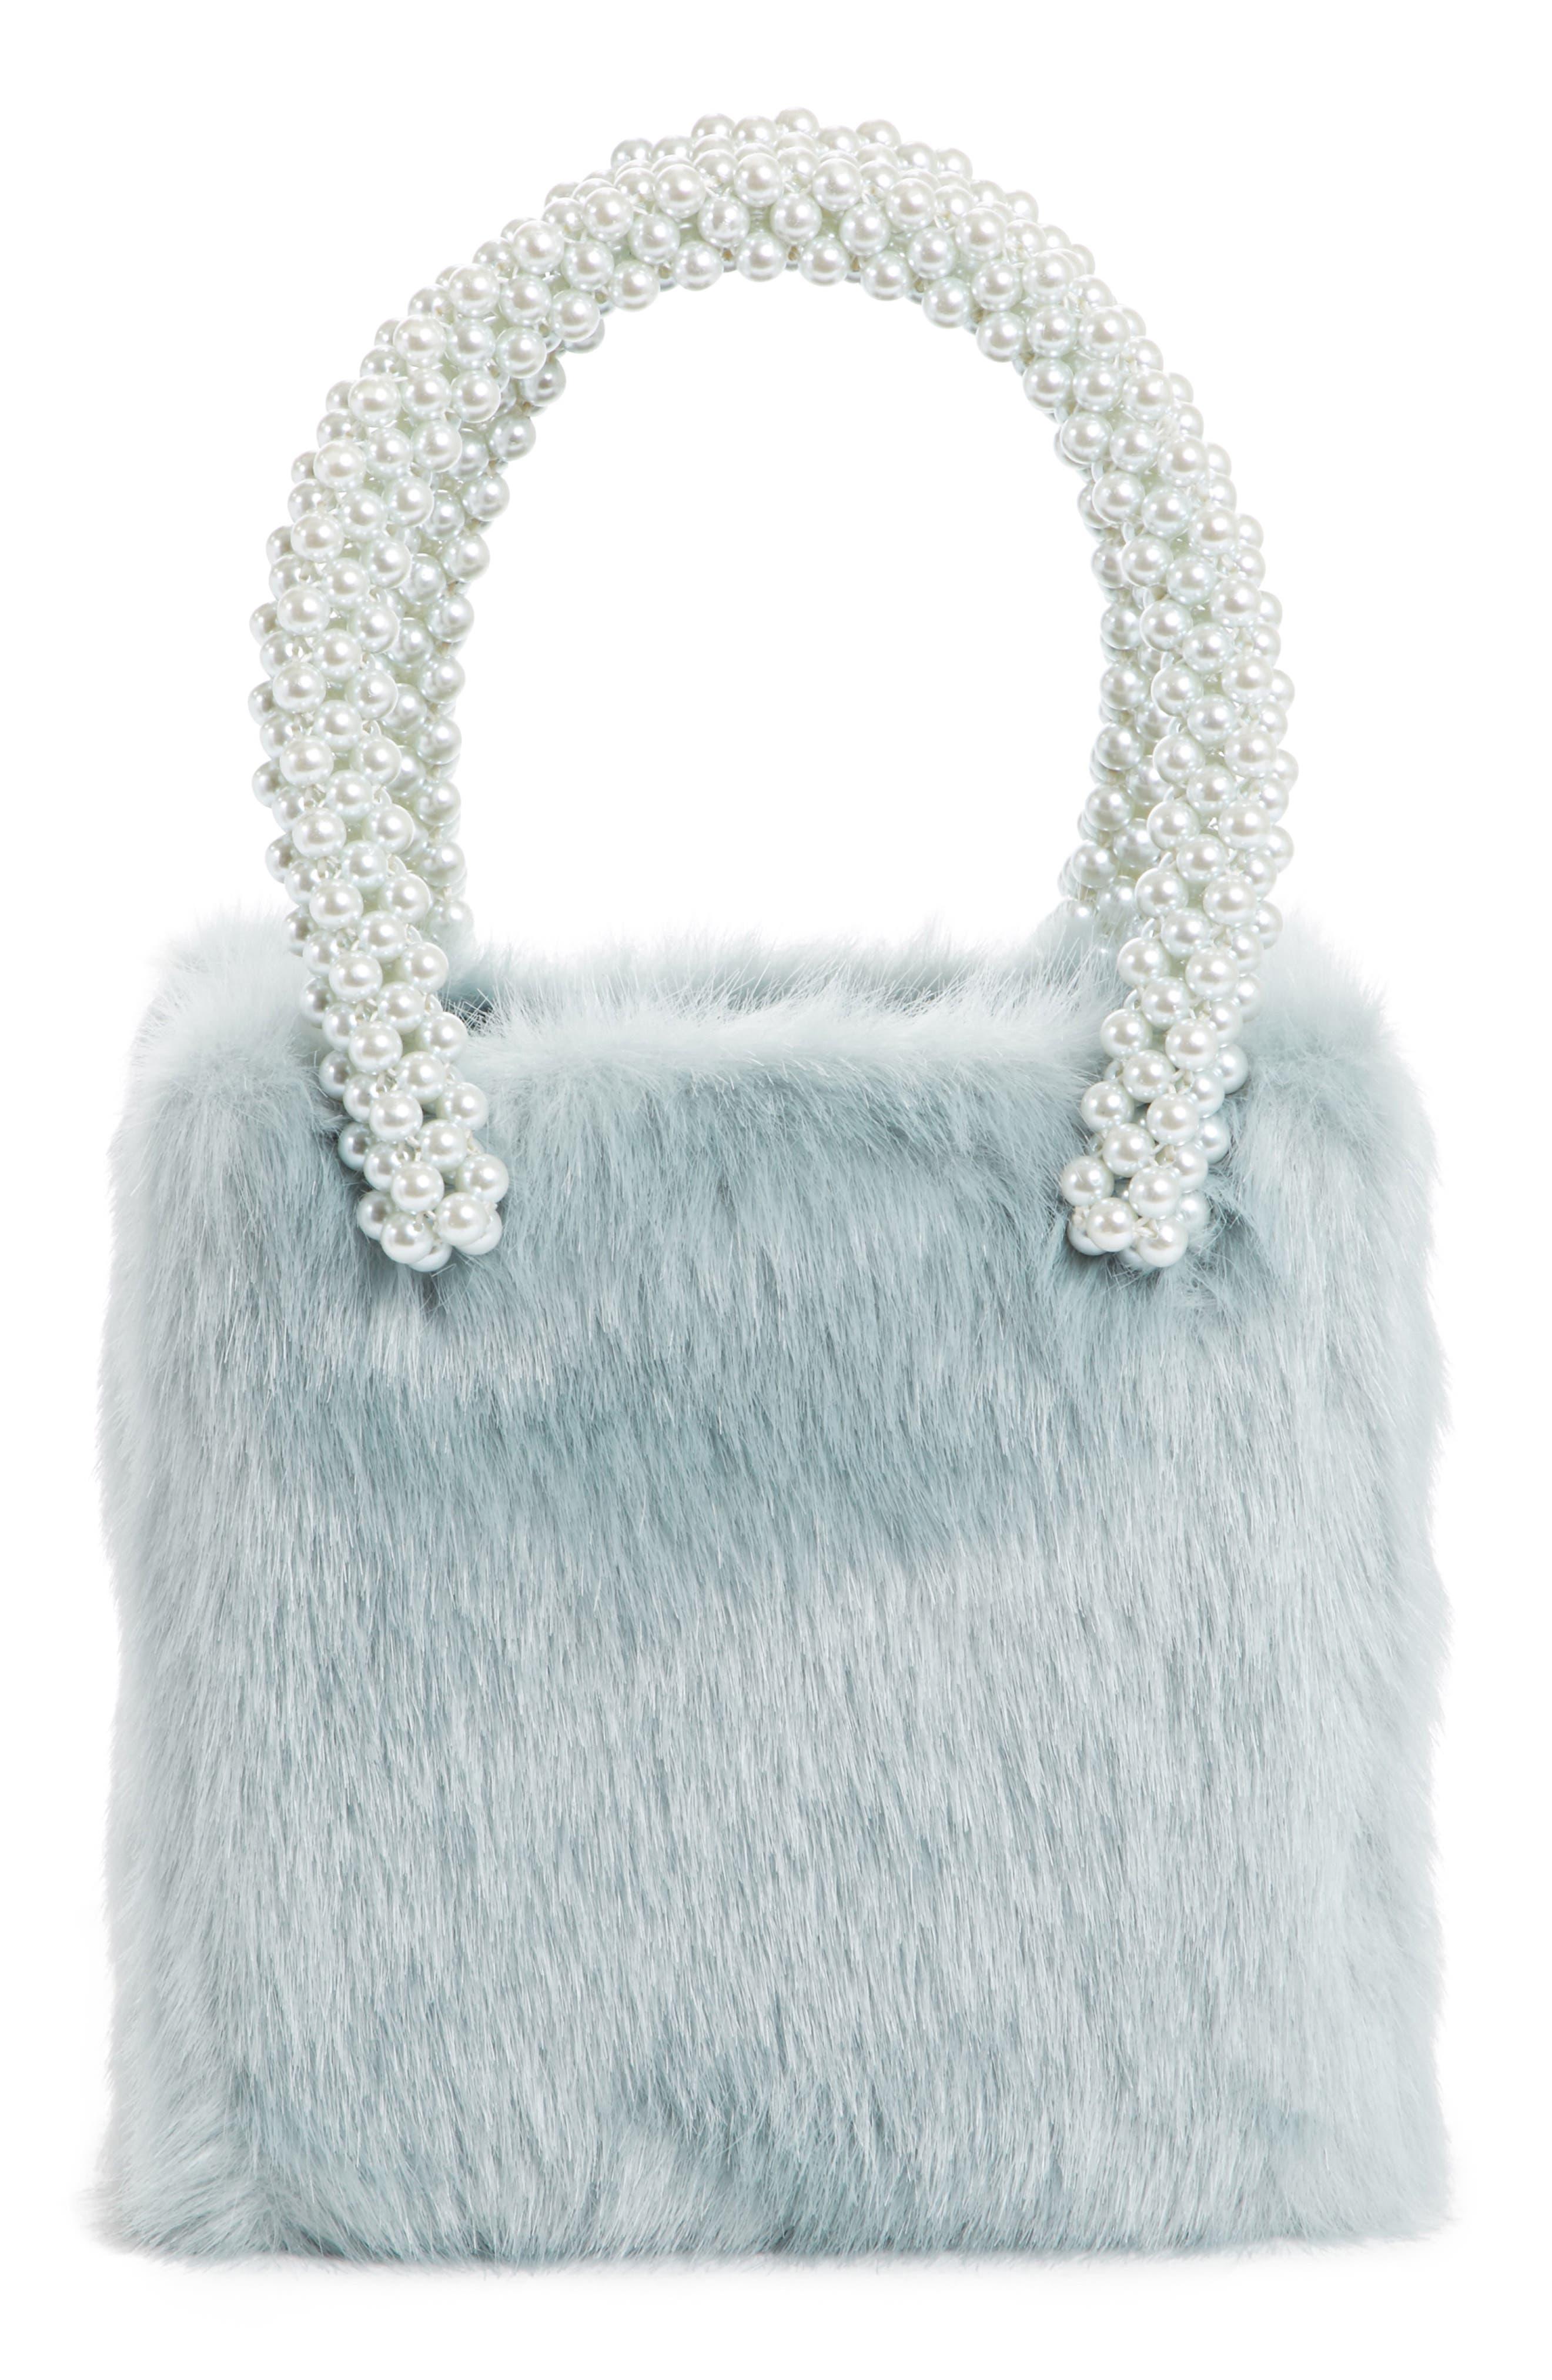 Una Check Faux Fur Bag with Imitation Pearl Handles,                         Main,                         color, 440